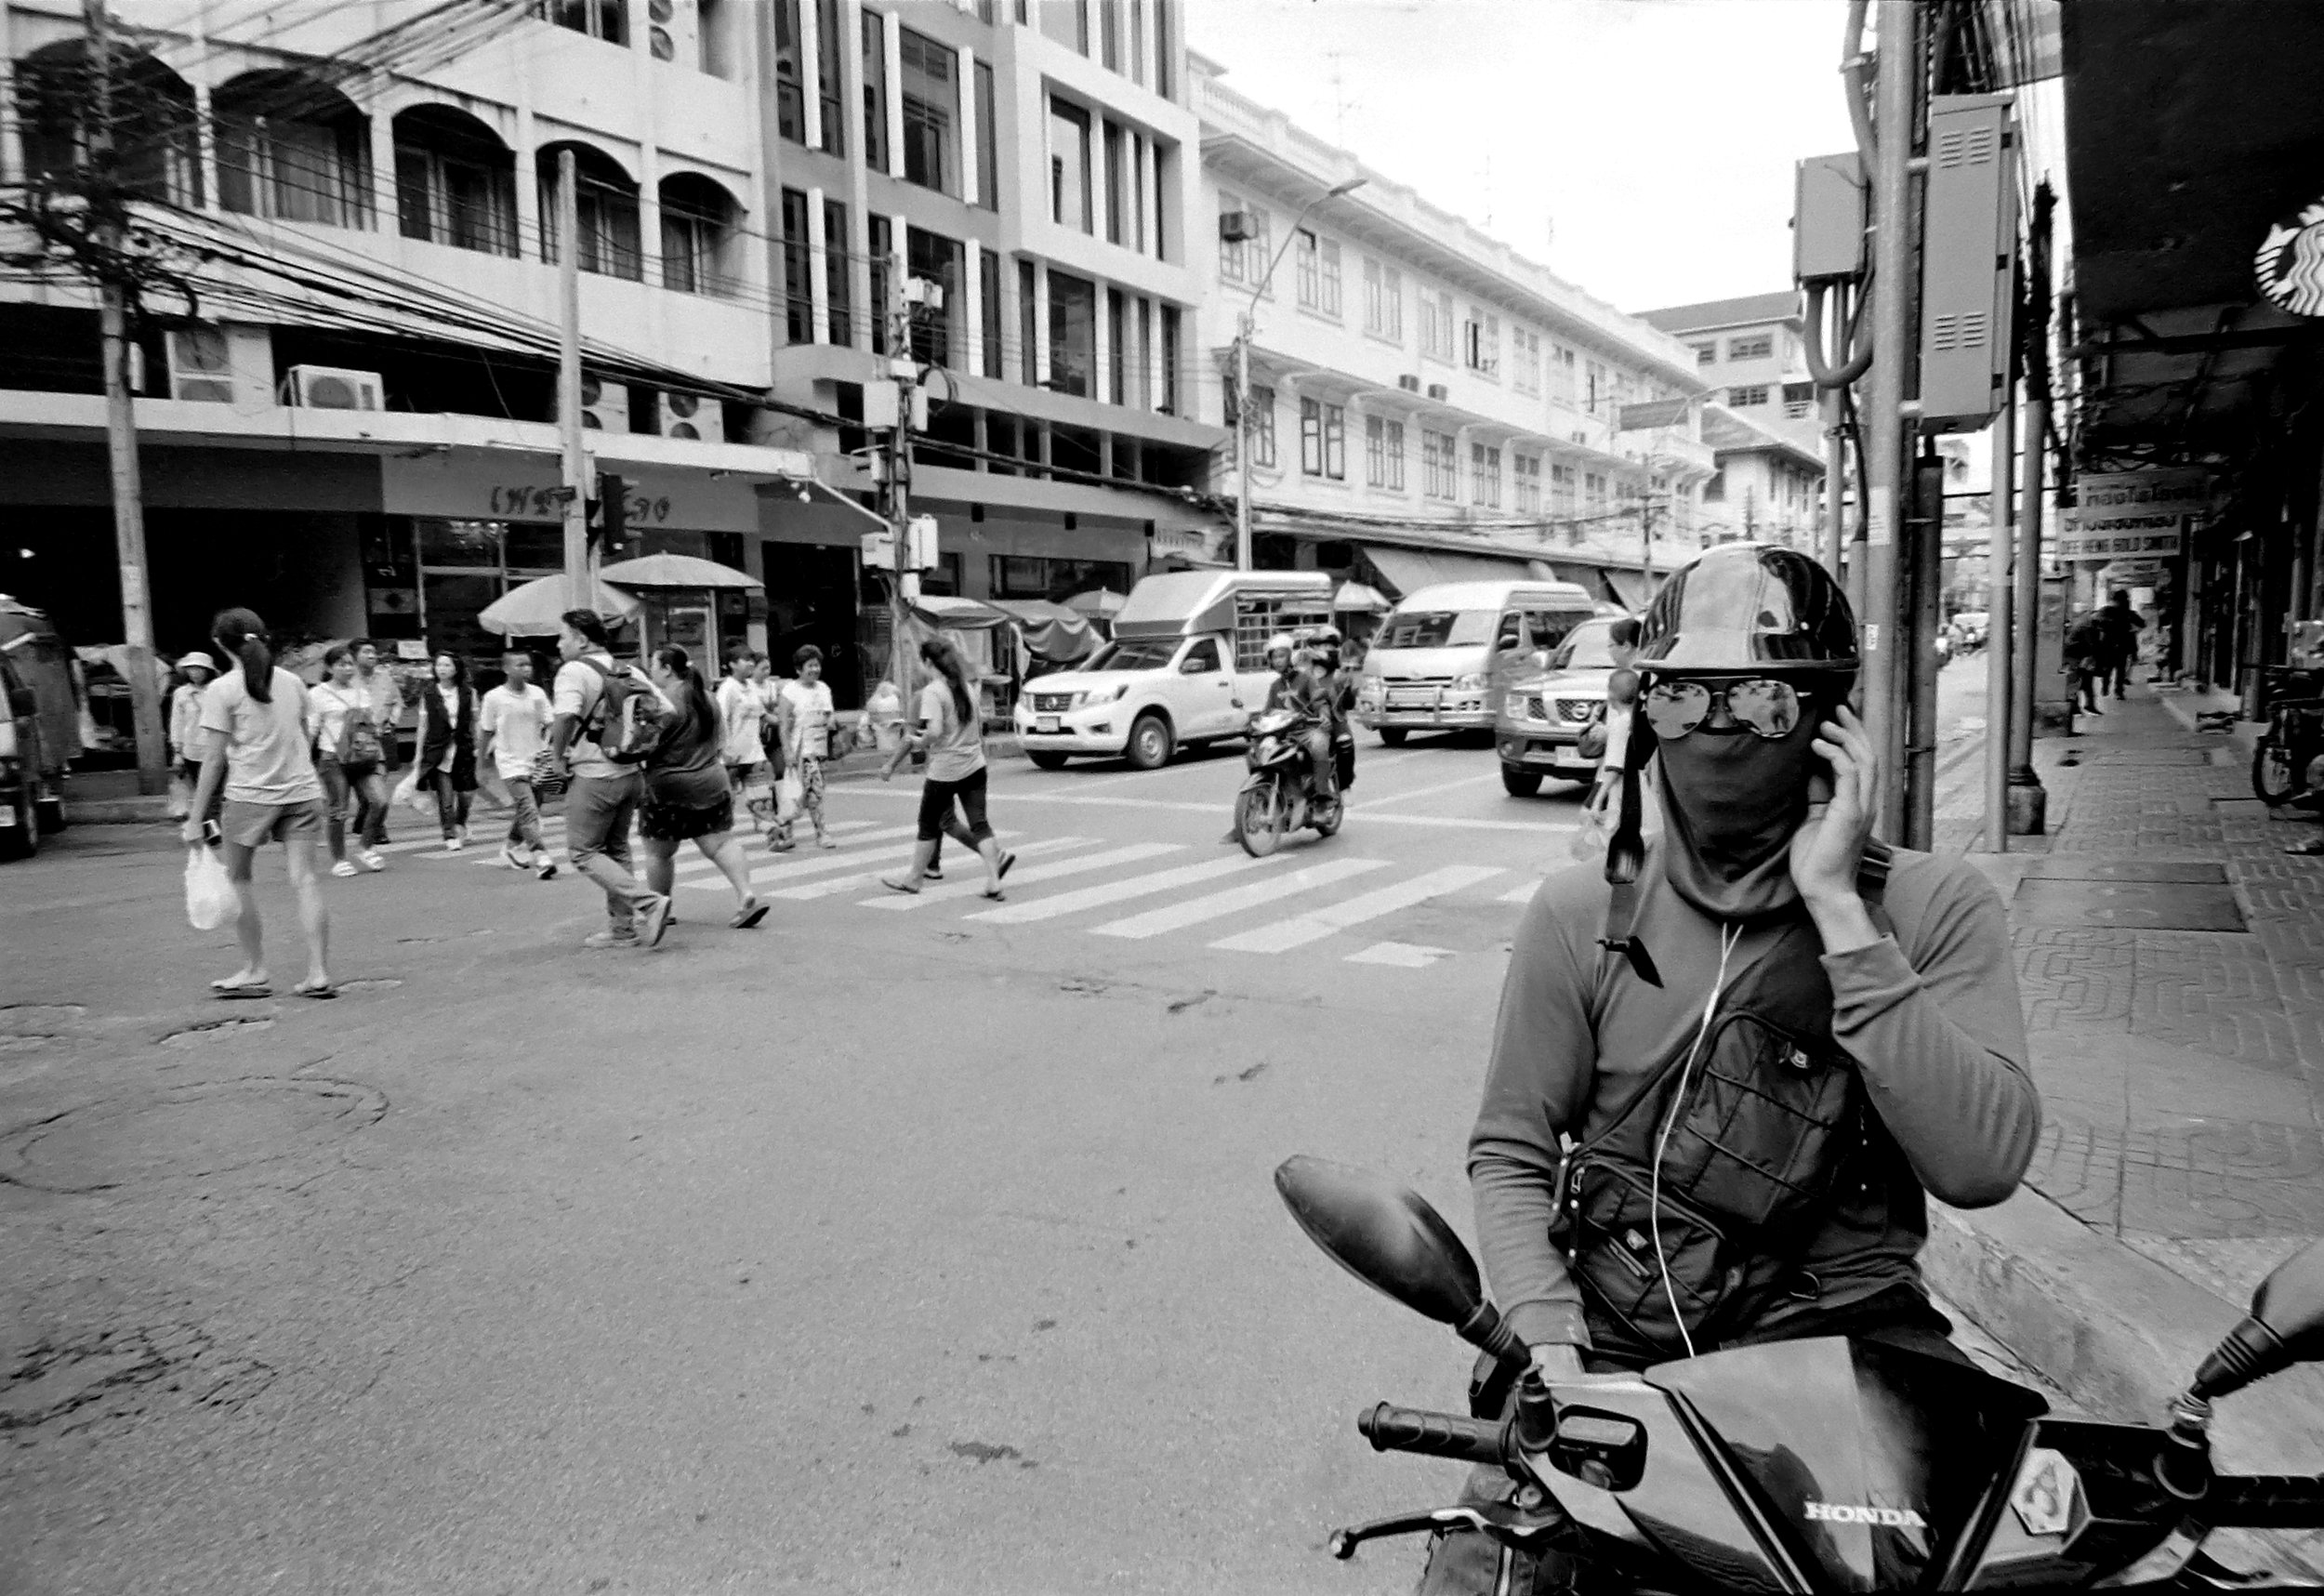 Chromacomaphoto Streetphotography Bangkok Thailand Leica 21mm super angulon sa 3 4 kodak tri x film (13).JPG